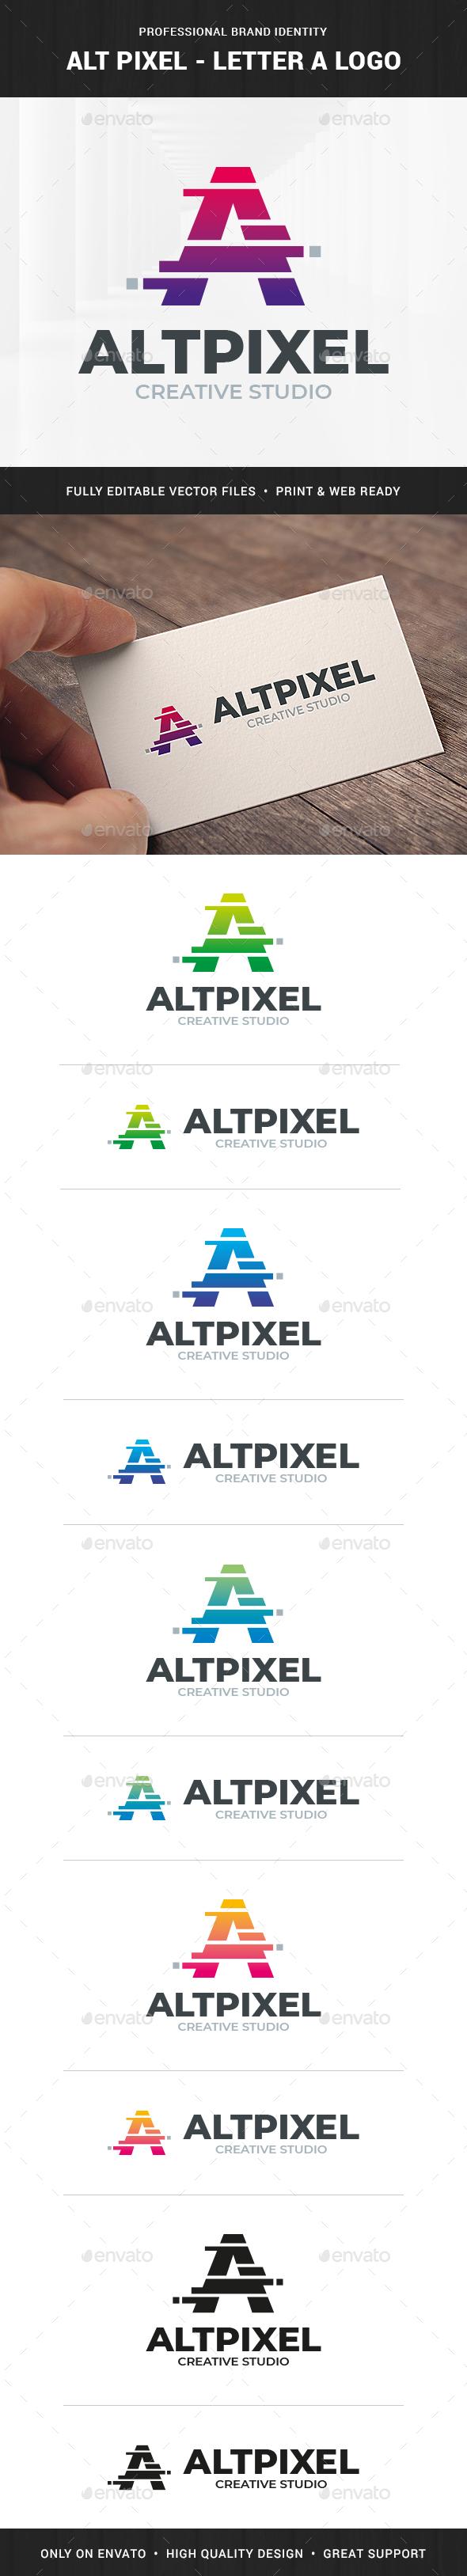 Alt Pixel - Letter A Logo